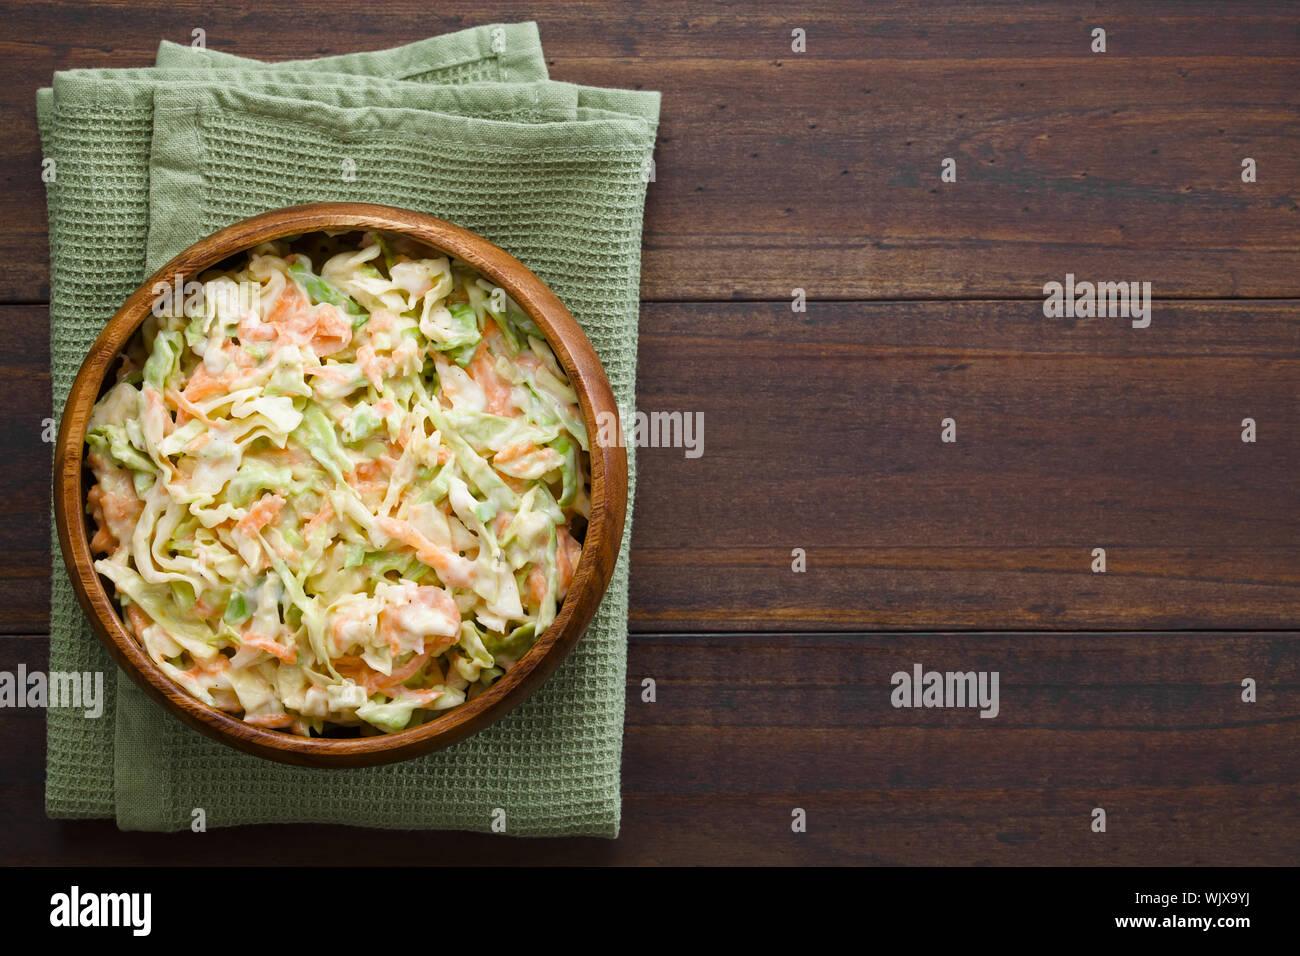 Zanahoria Rallada En Ingles – Zanahorias inflexiones de 'zanahoria' (adj):